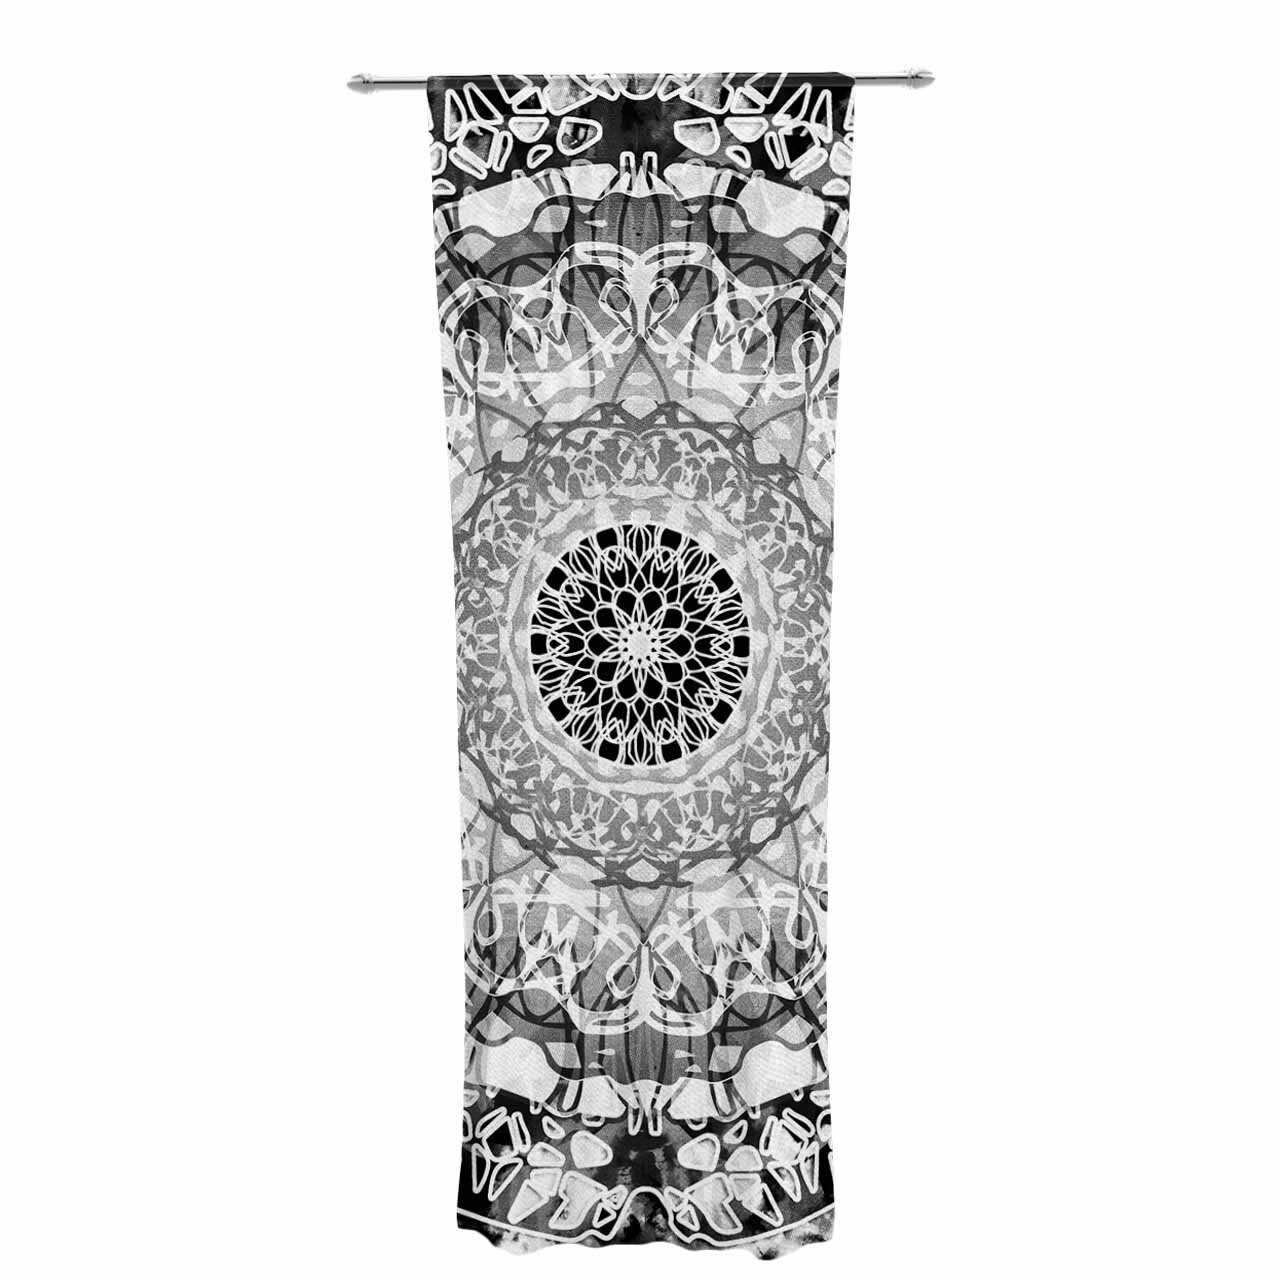 Kess InHouse Nina May Tie-Dye Mandala Jain Black White Illustration 26 x 26 Square Floor Pillow